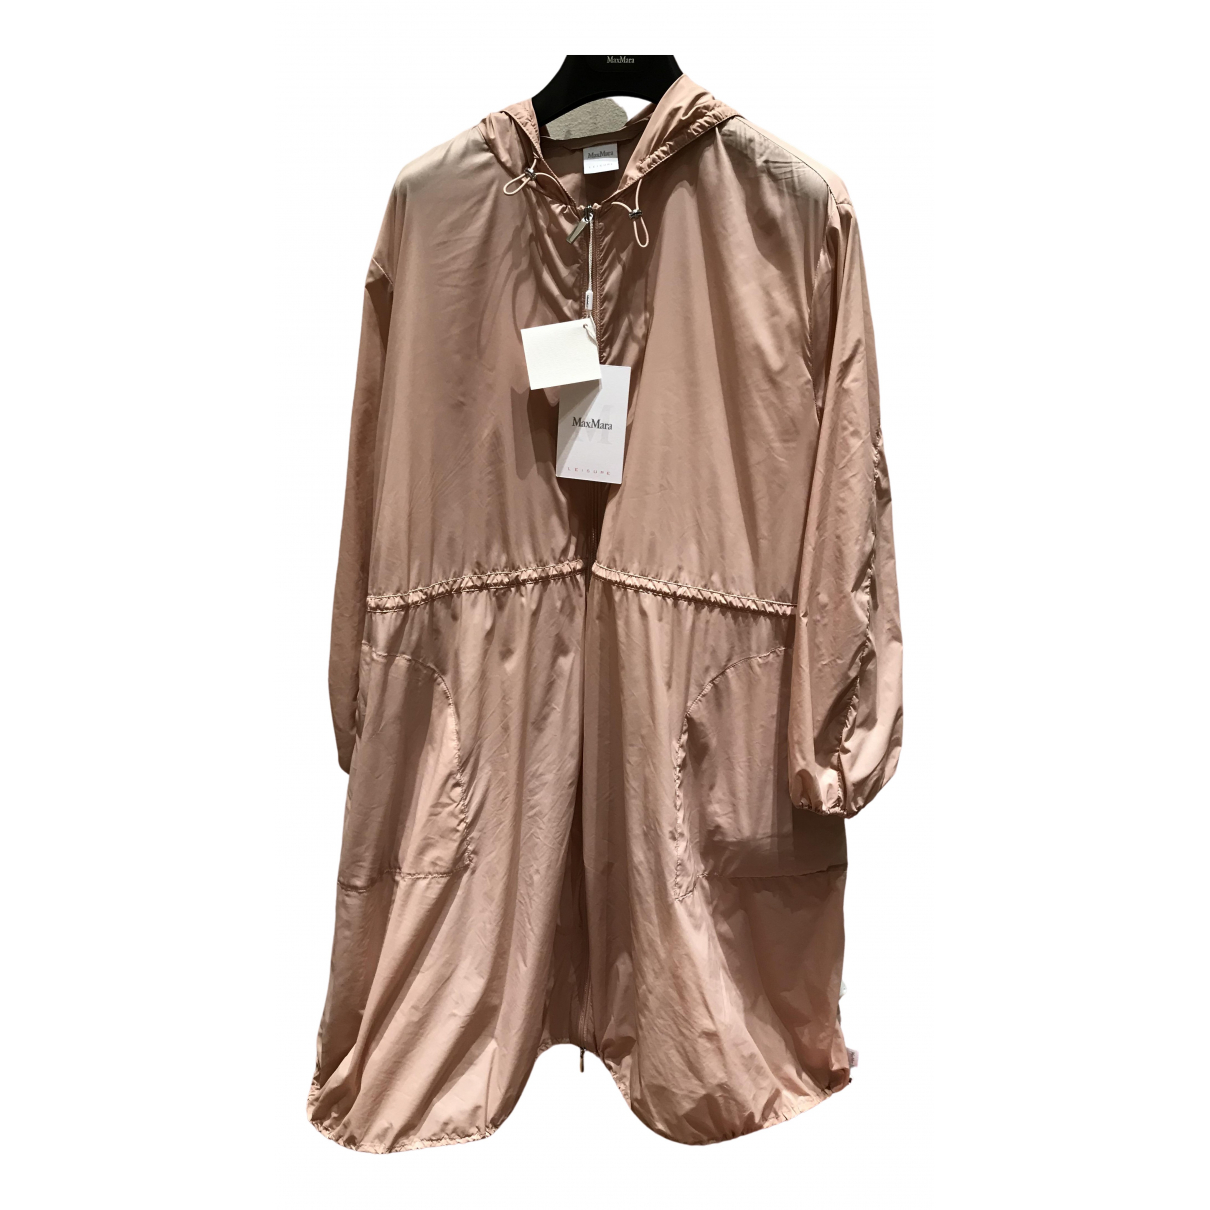 Max Mara \N Pink coat for Women XS International